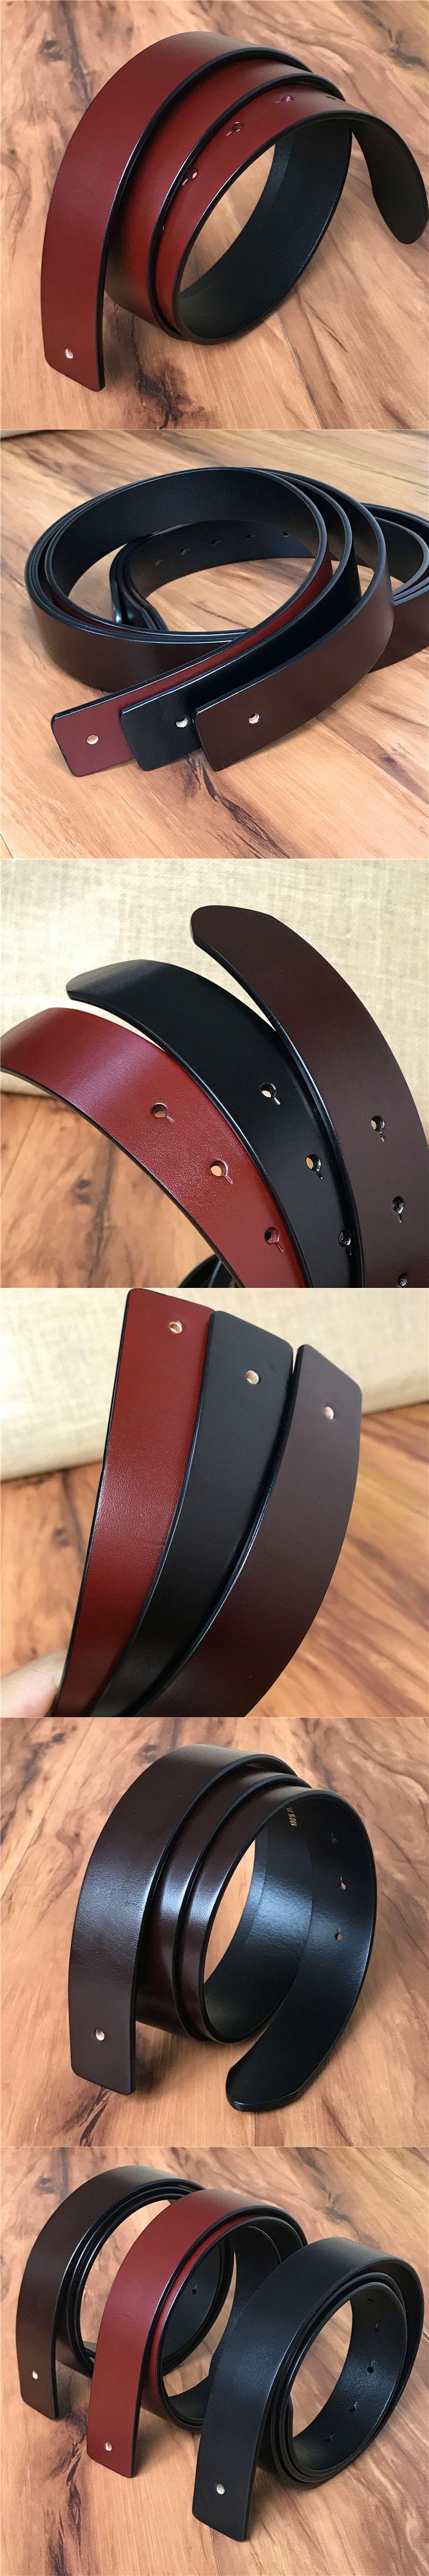 TOP Italy Genuine Leather Men Belt Without Belt Buckle 3.3CM Leather Belts For Men Ceinture Homme Cinturon Cinto 105-120CM SP03